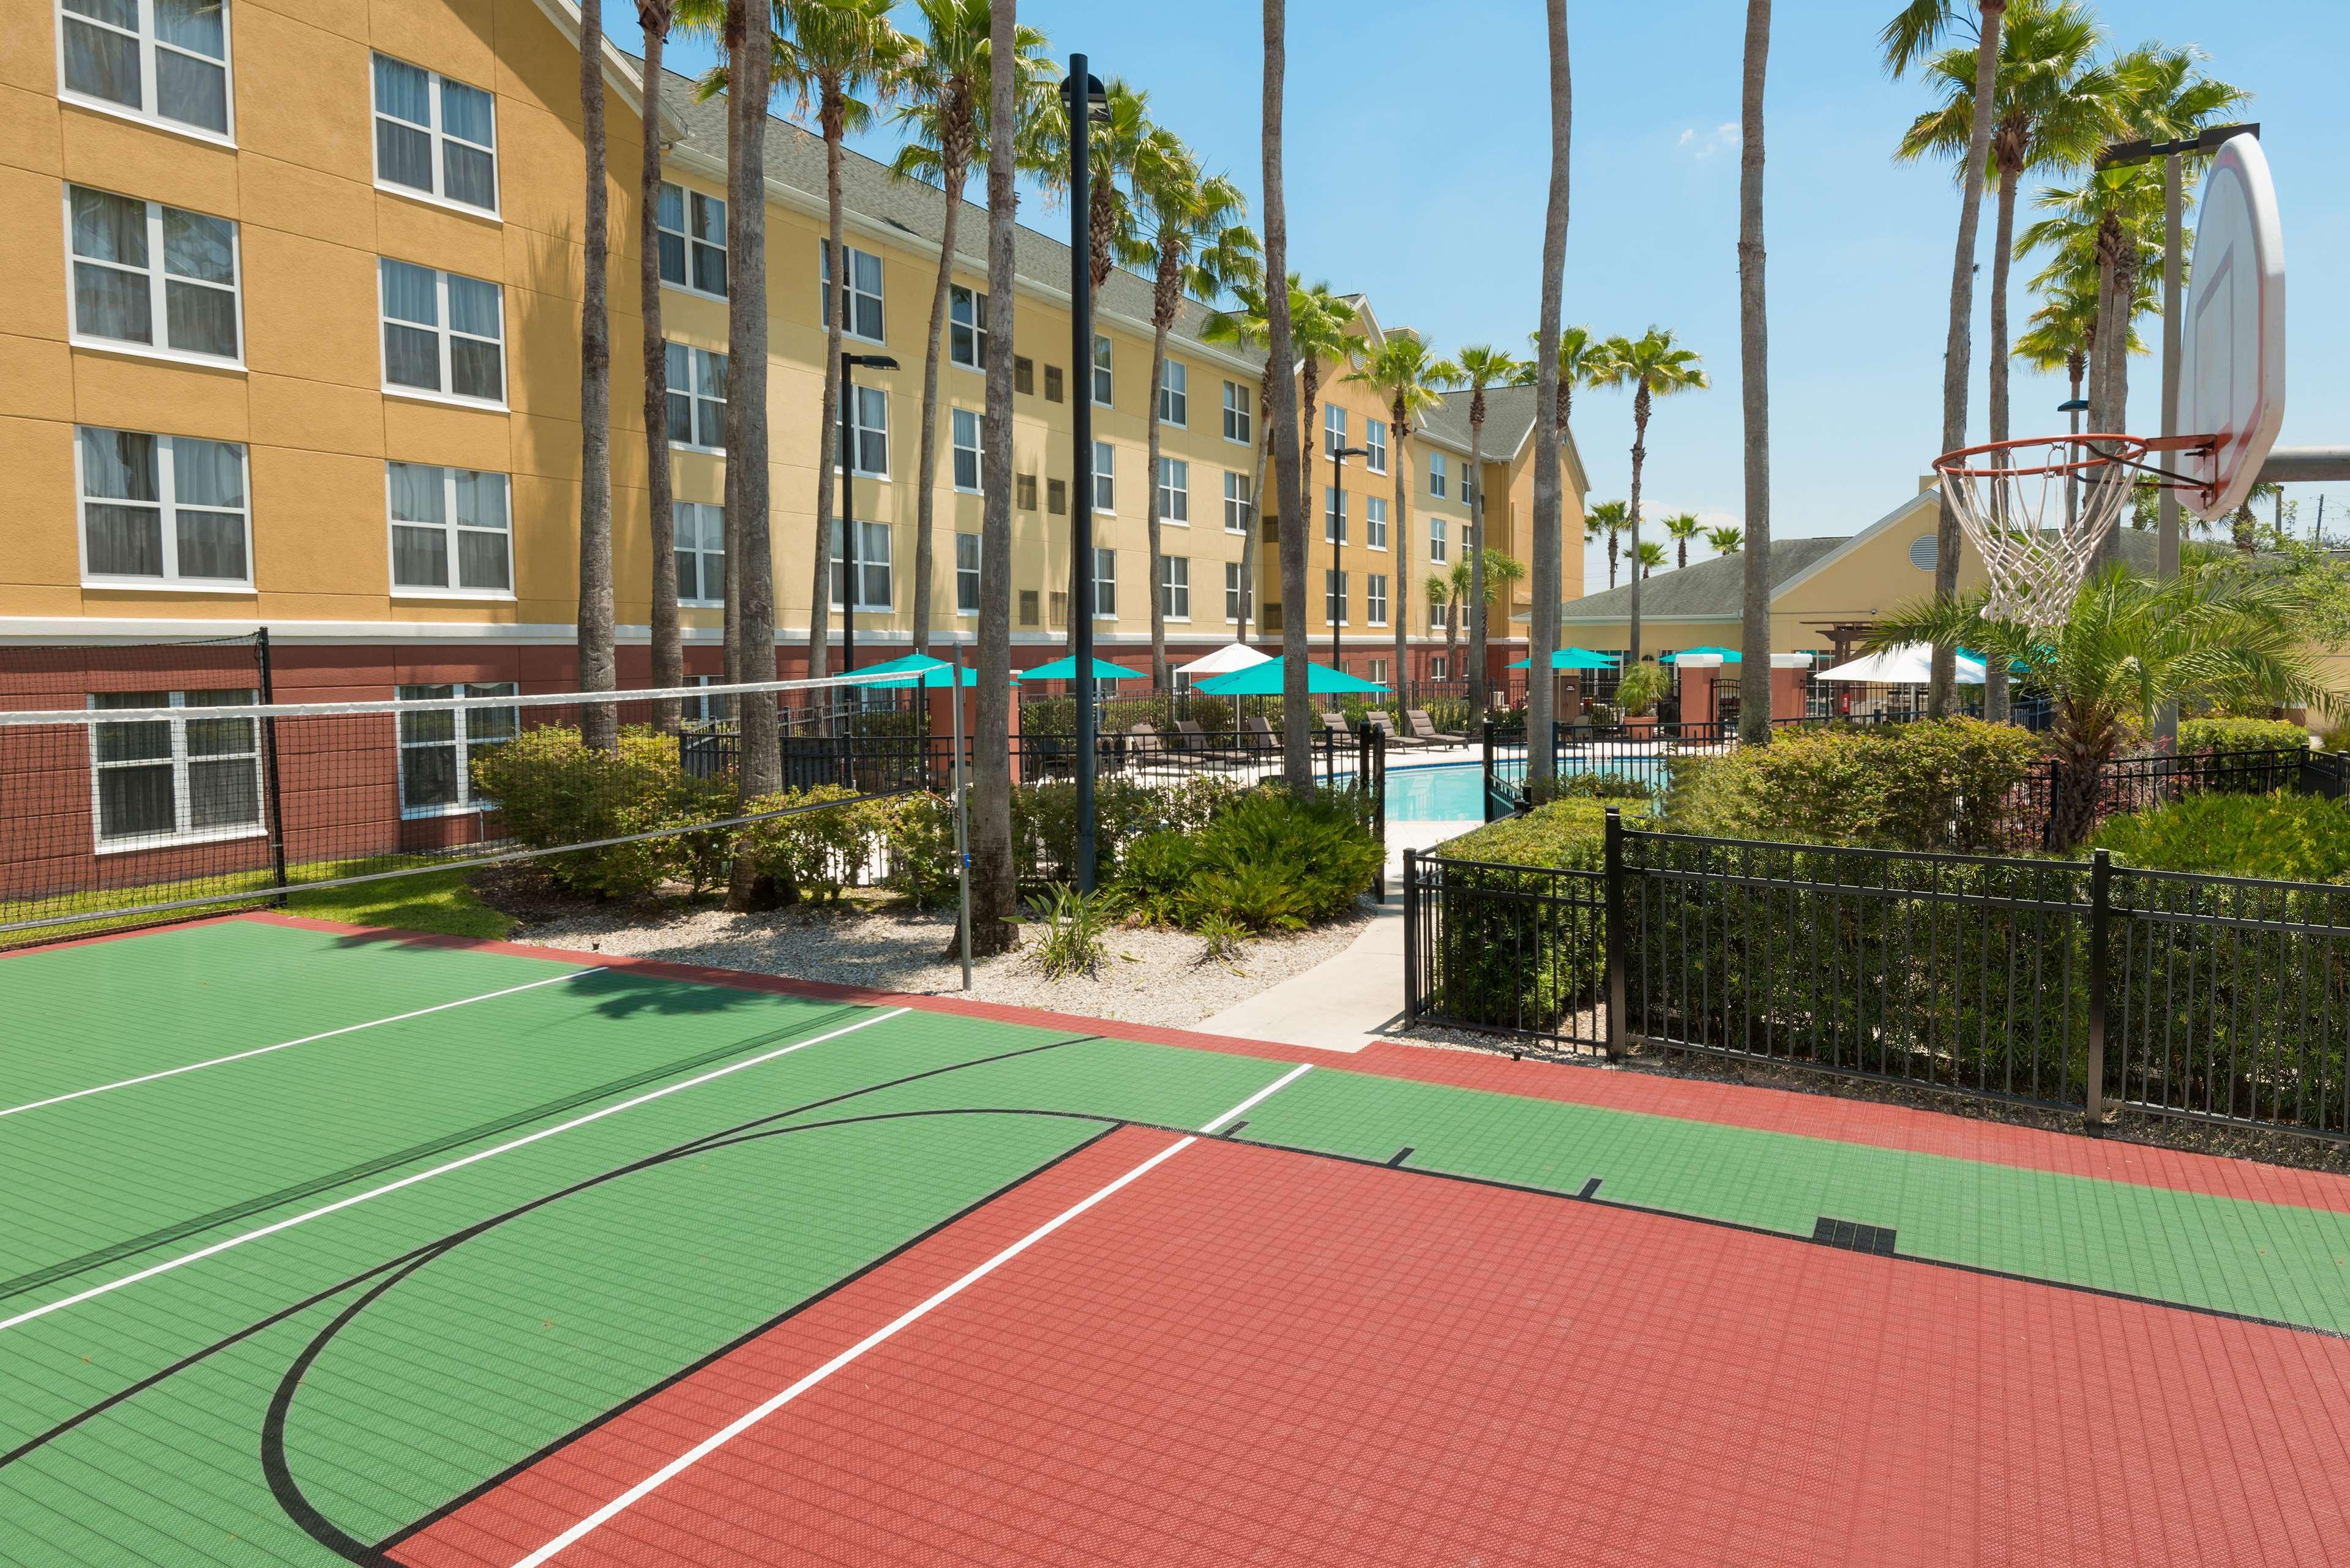 Homewood Suites by Hilton Orlando-UCF Area image 32